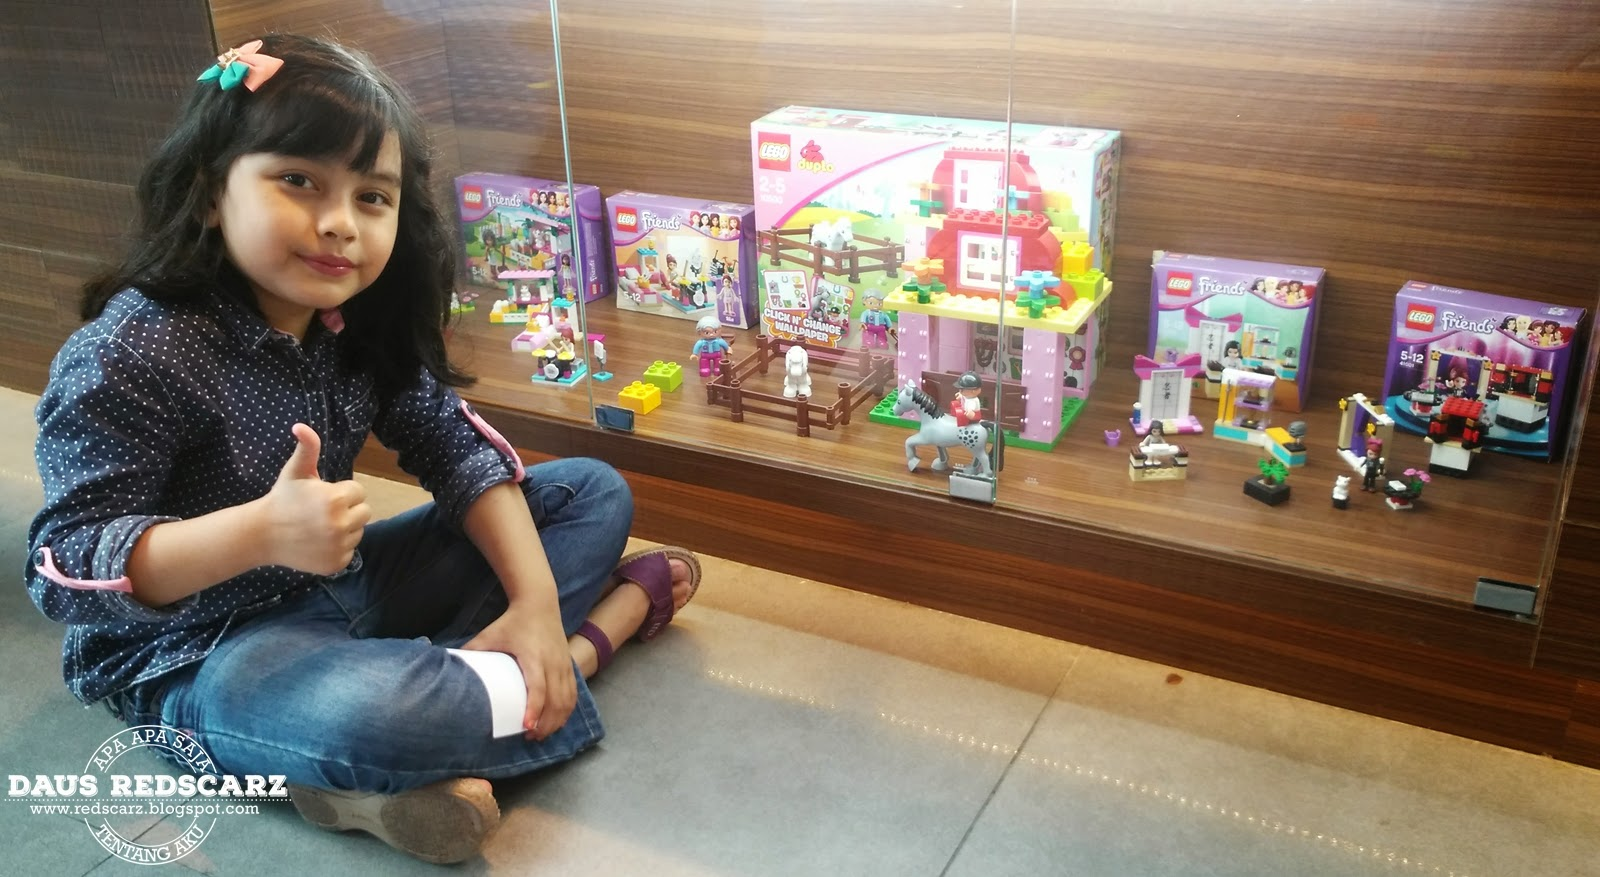 Daus Redscarz Lego Friends Live Legoland Malaysia Resort